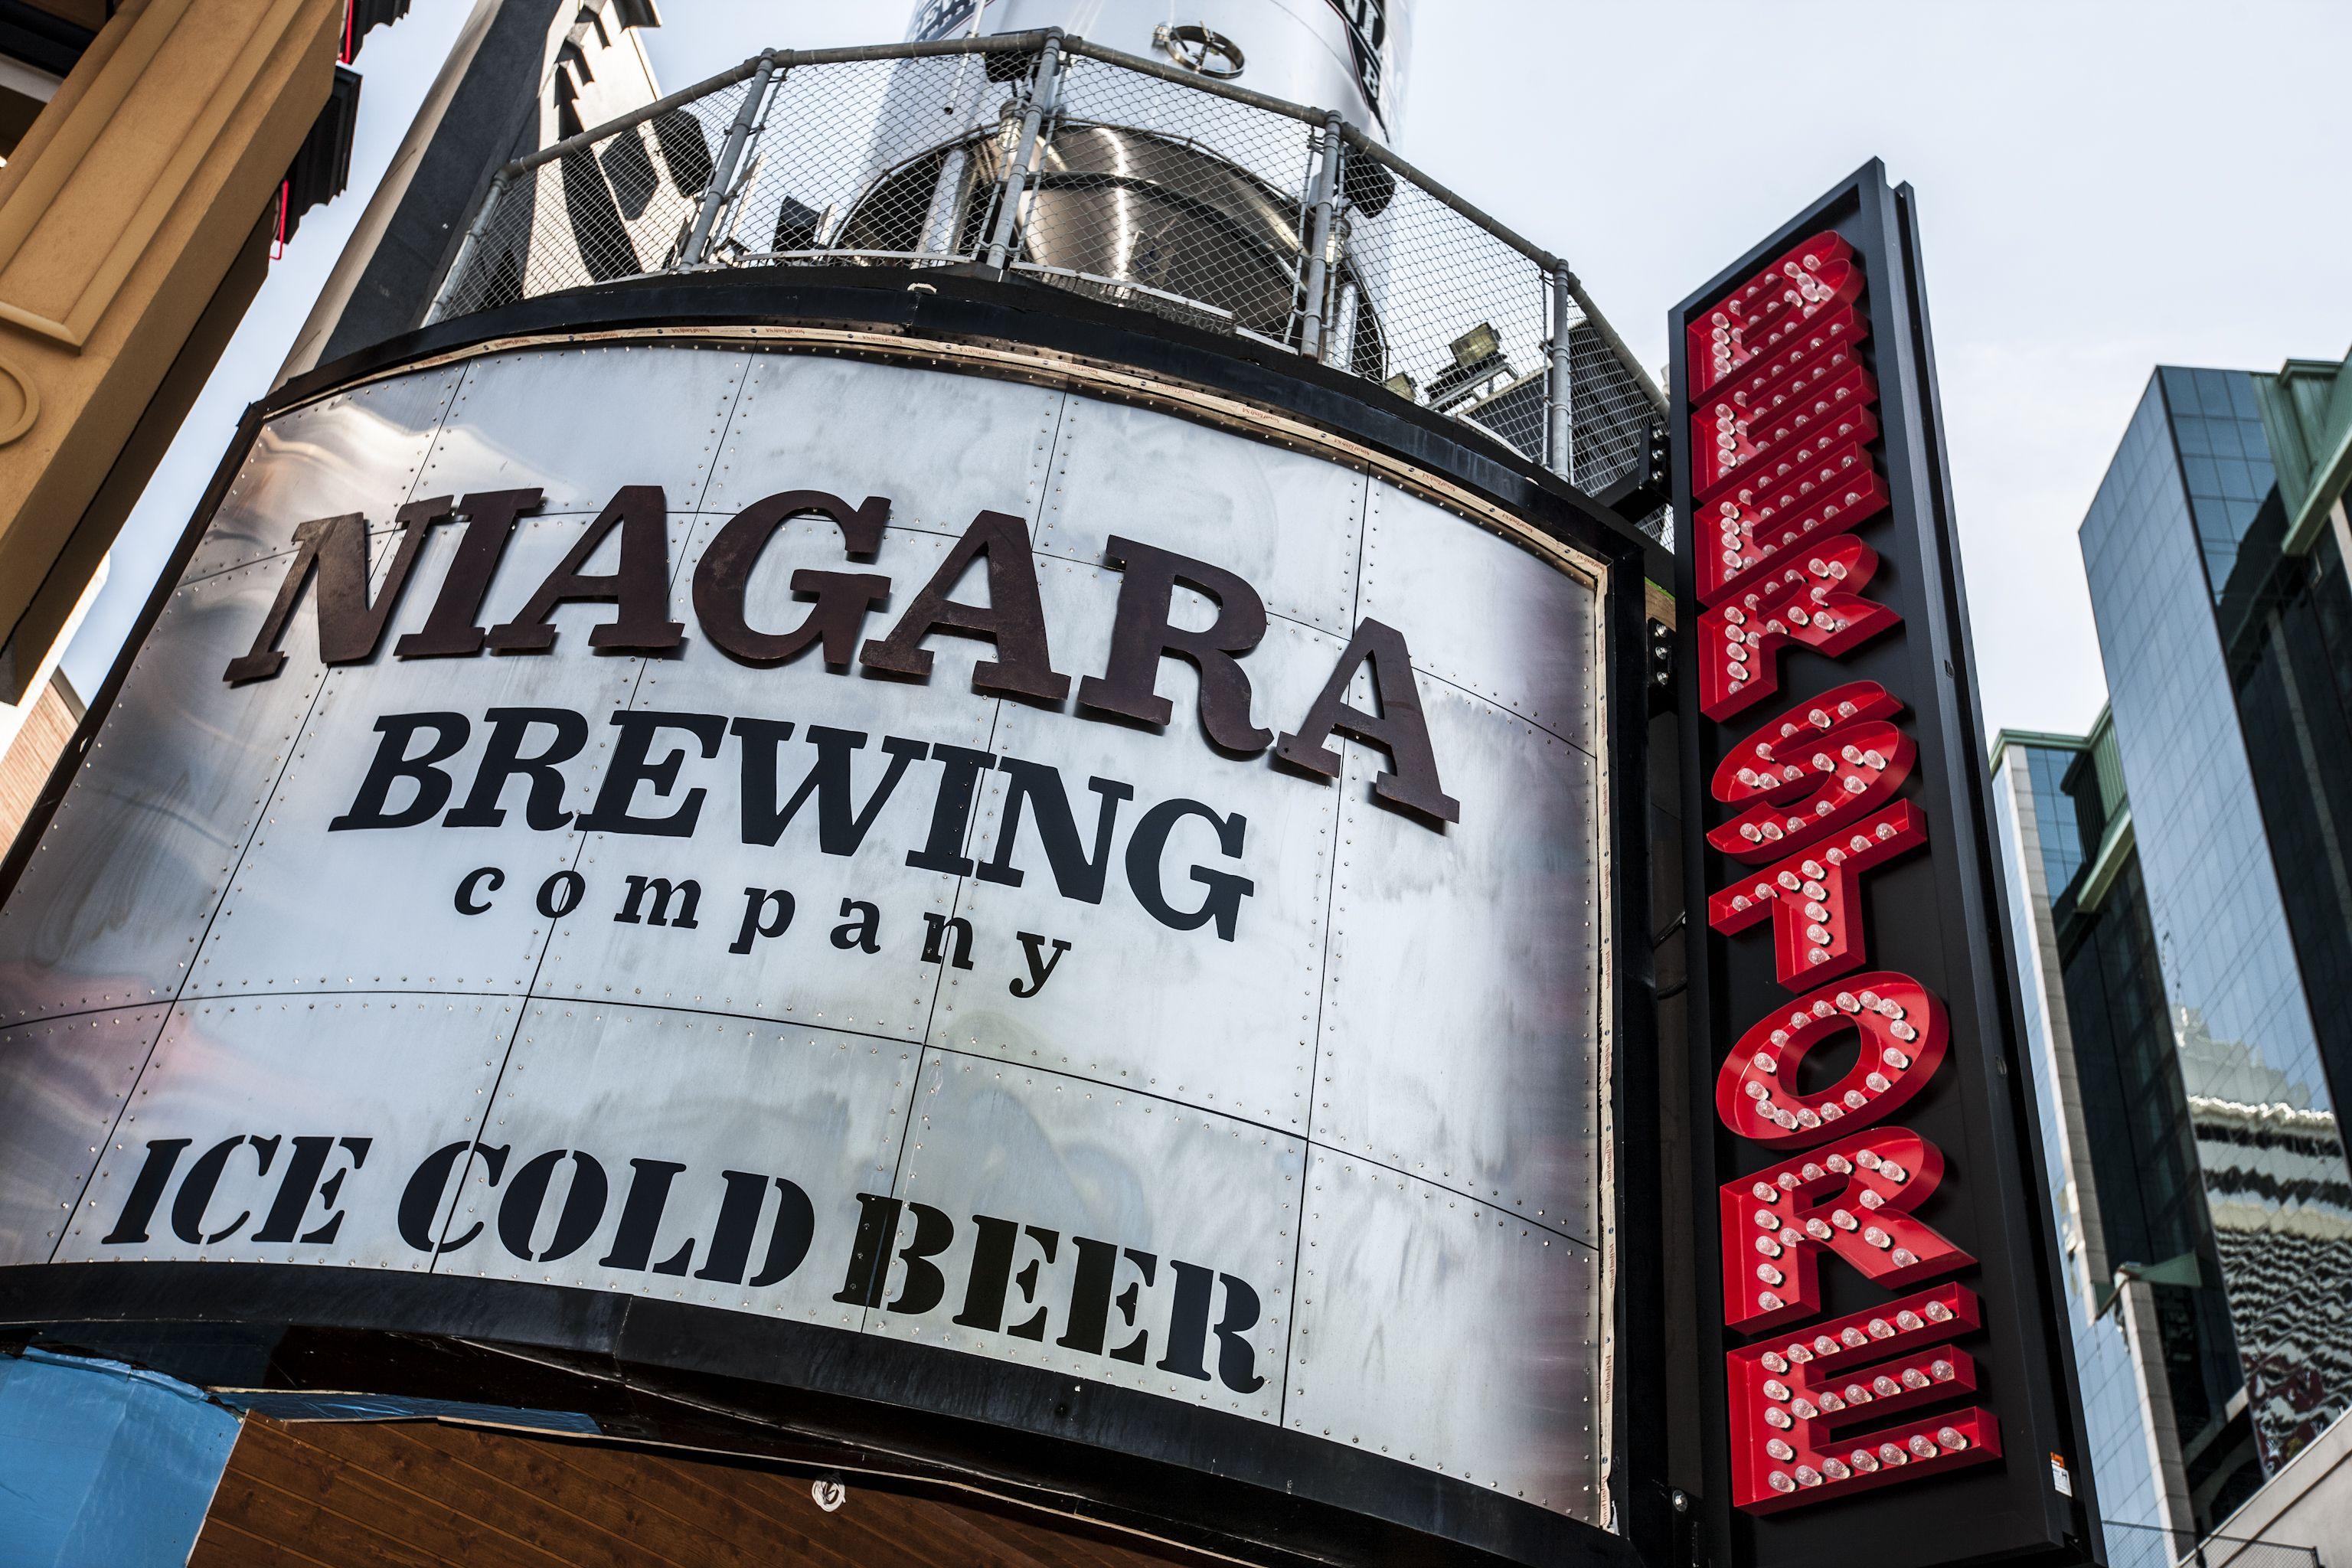 24+ Craft beer subscription ontario ideas in 2021